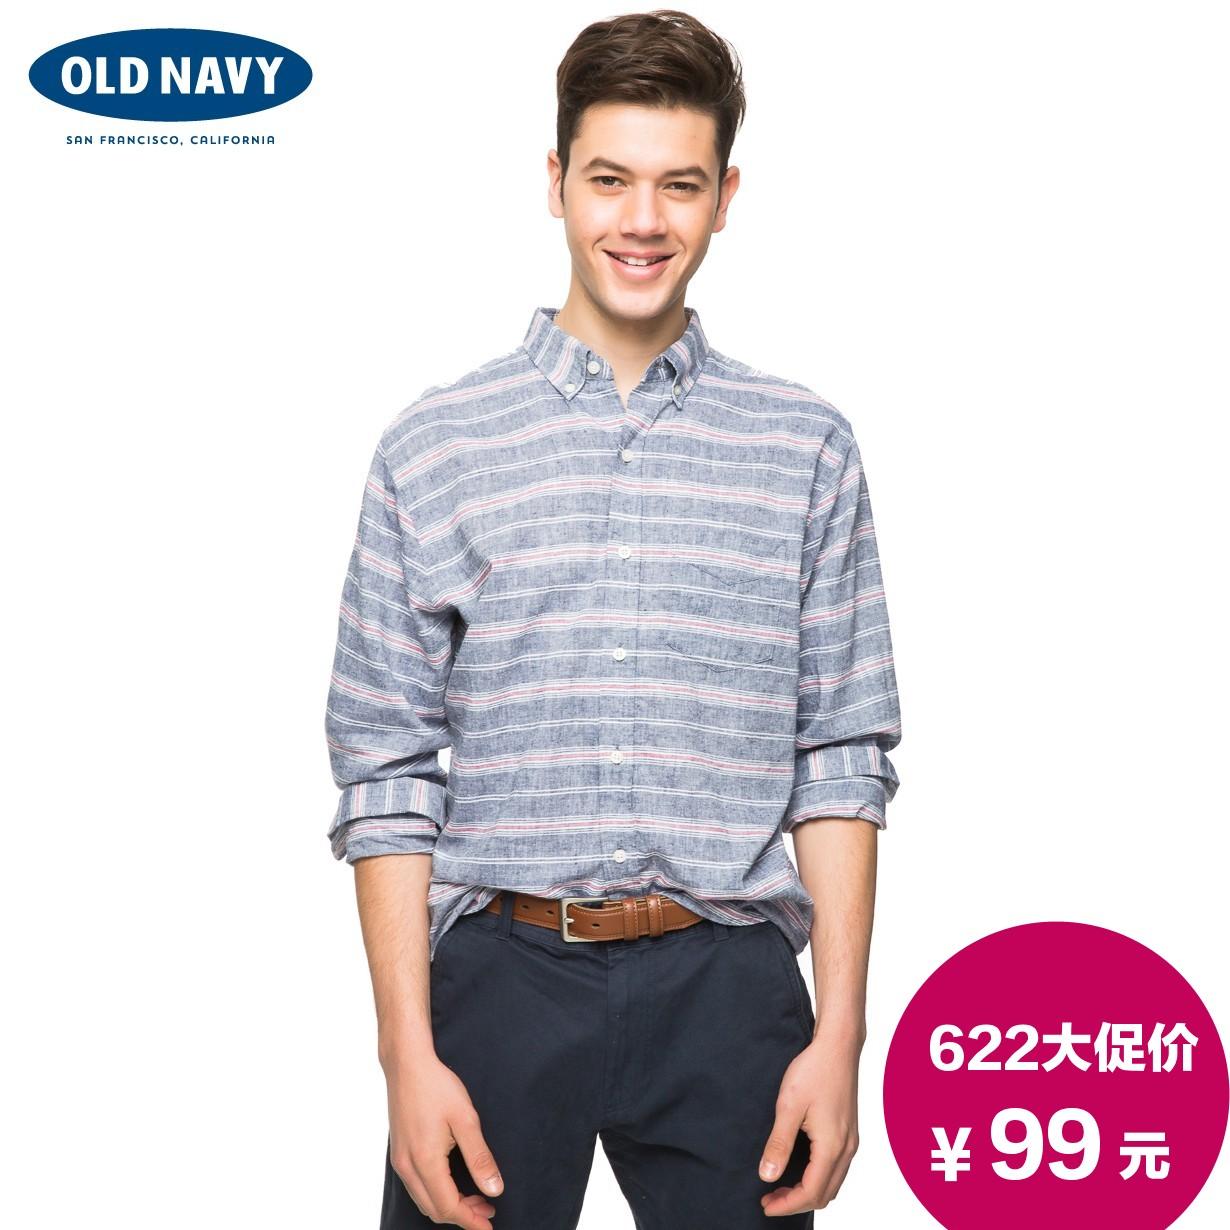 Рубашка мужская OLD NAVY 000369129 369129 199 рубашка мужская old navy 000438245 438245